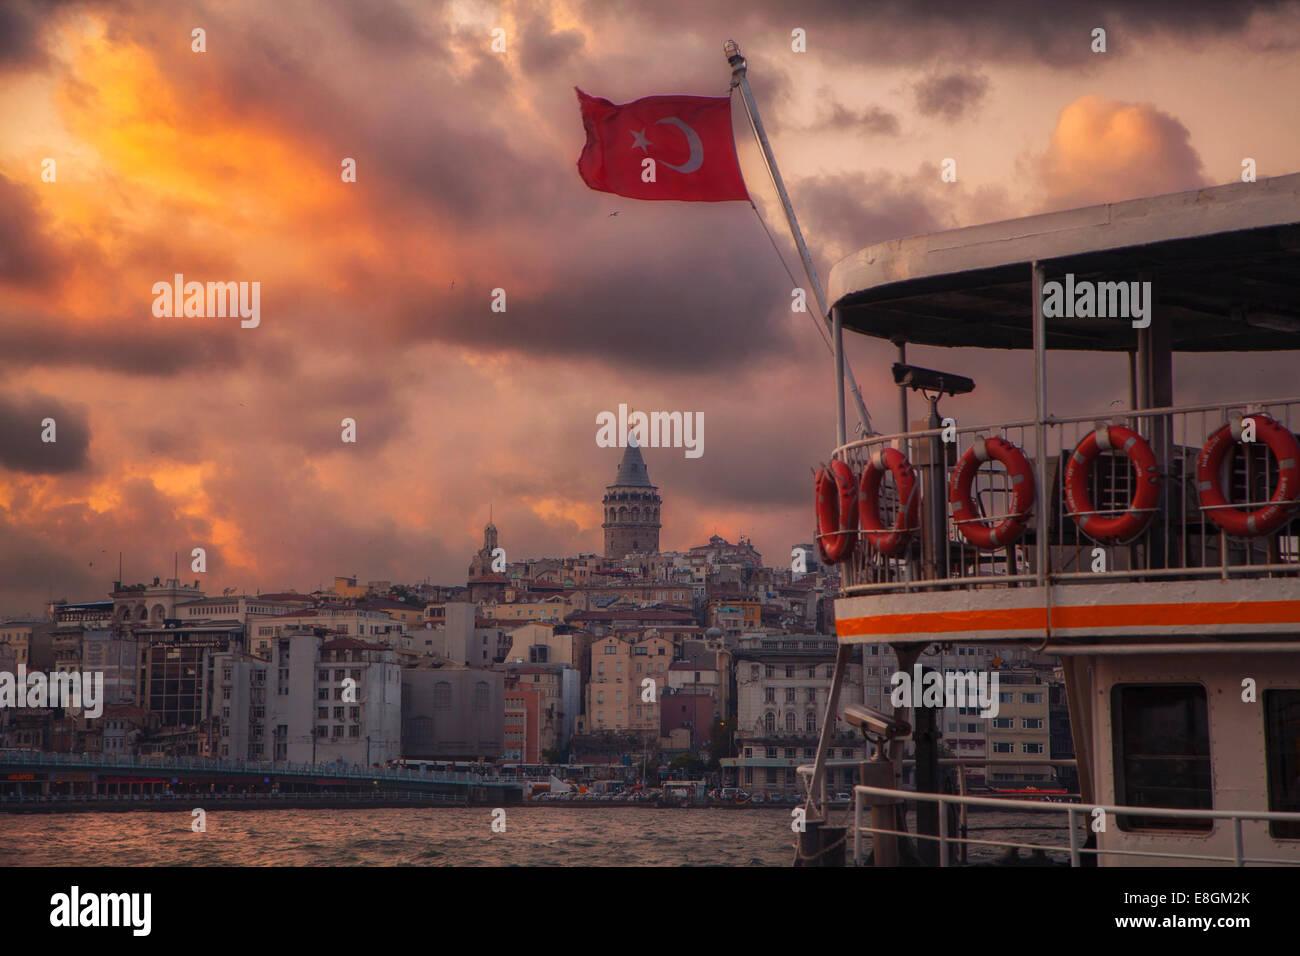 Turquía, Estambul, torre de Galata Imagen De Stock